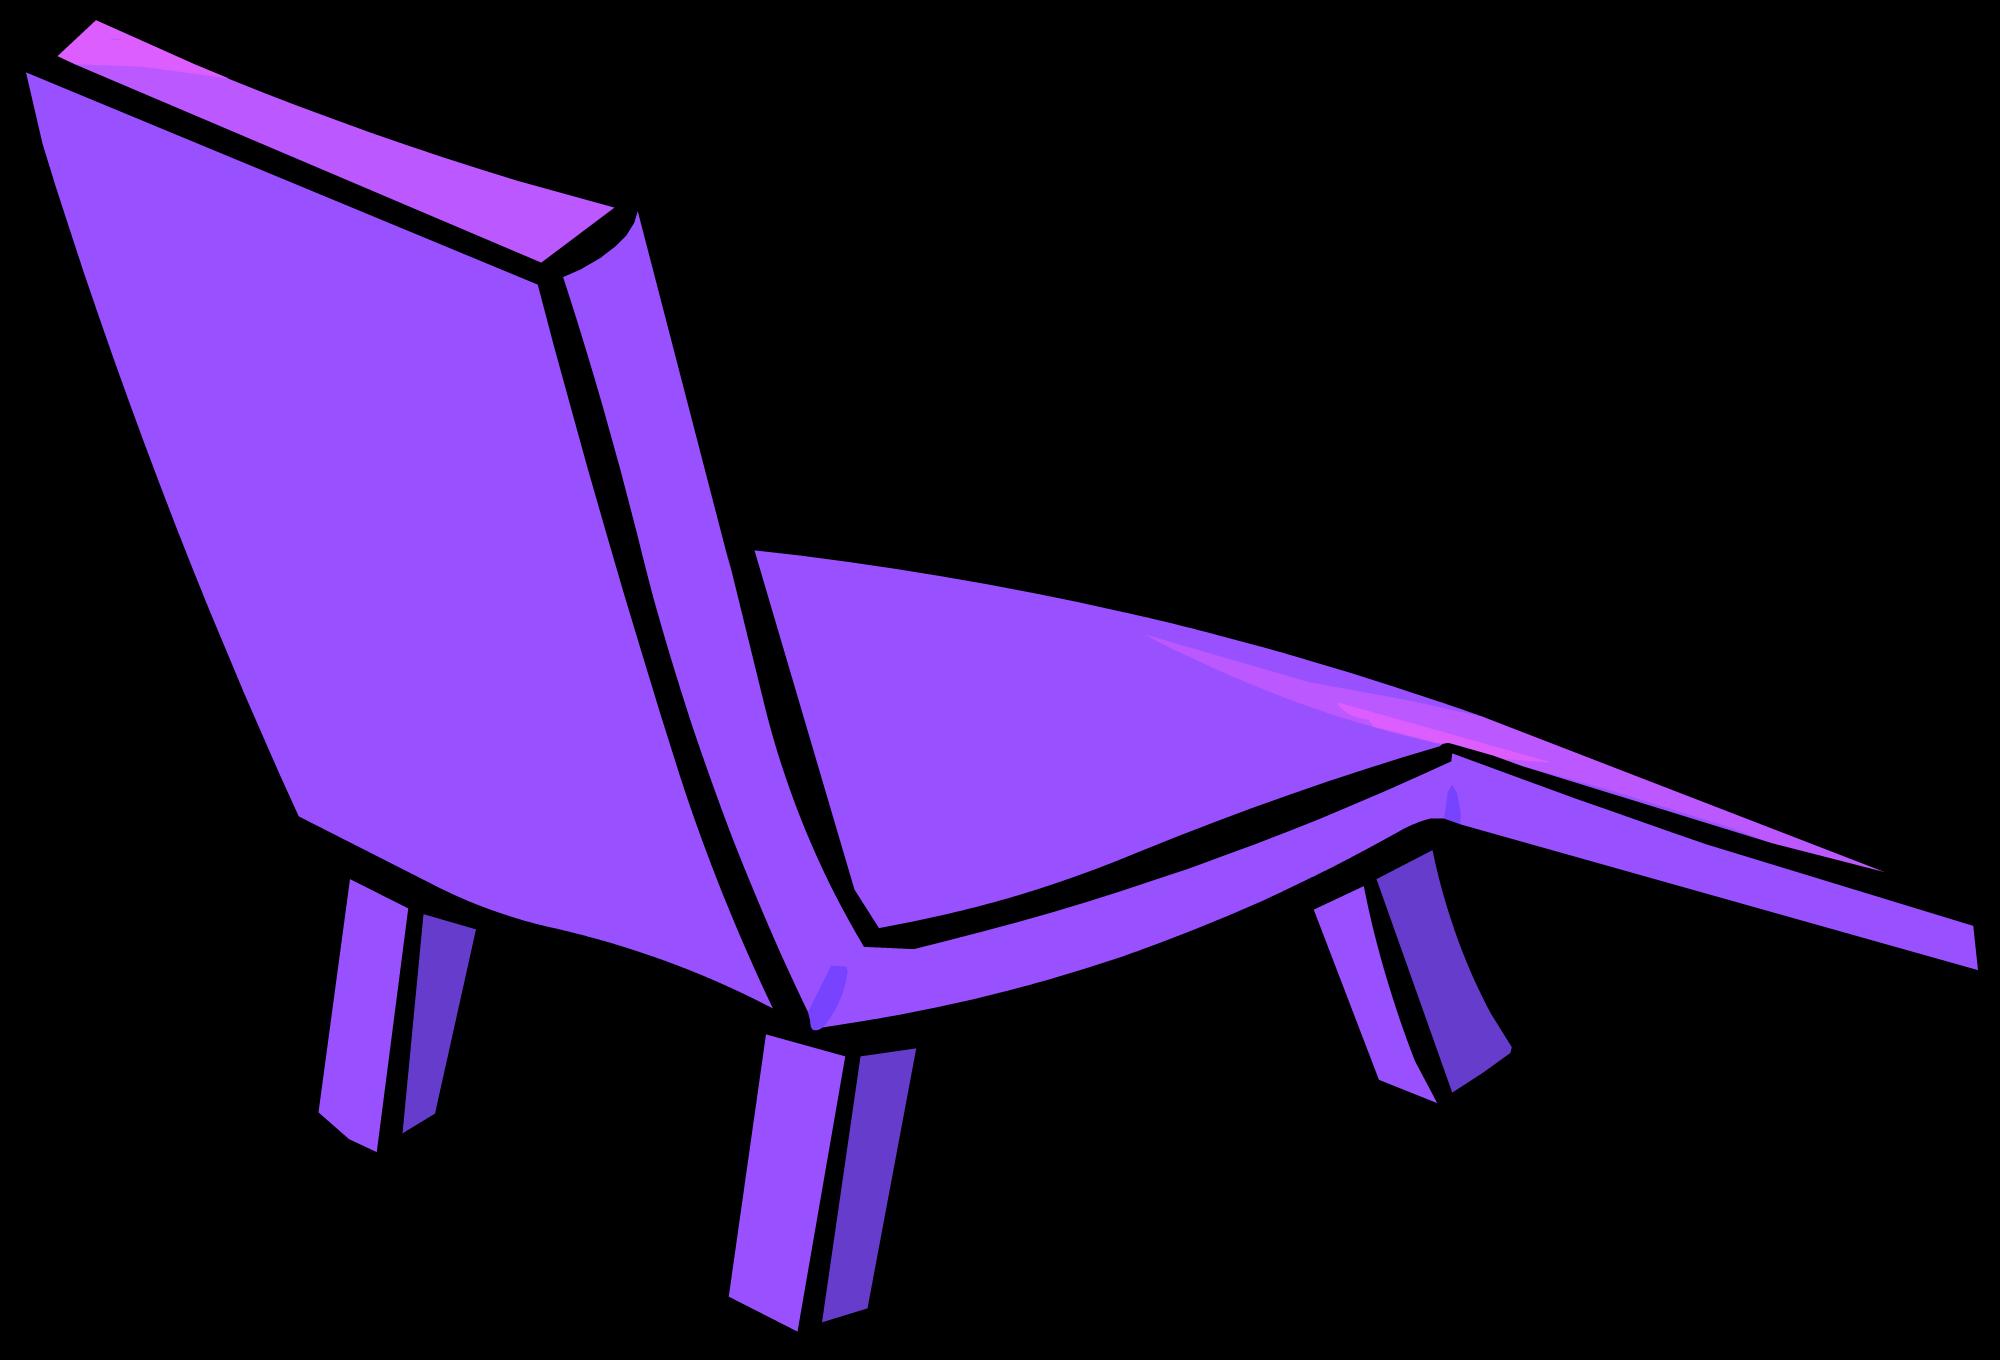 Image plastic lawn sprite. Furniture clipart purple chair